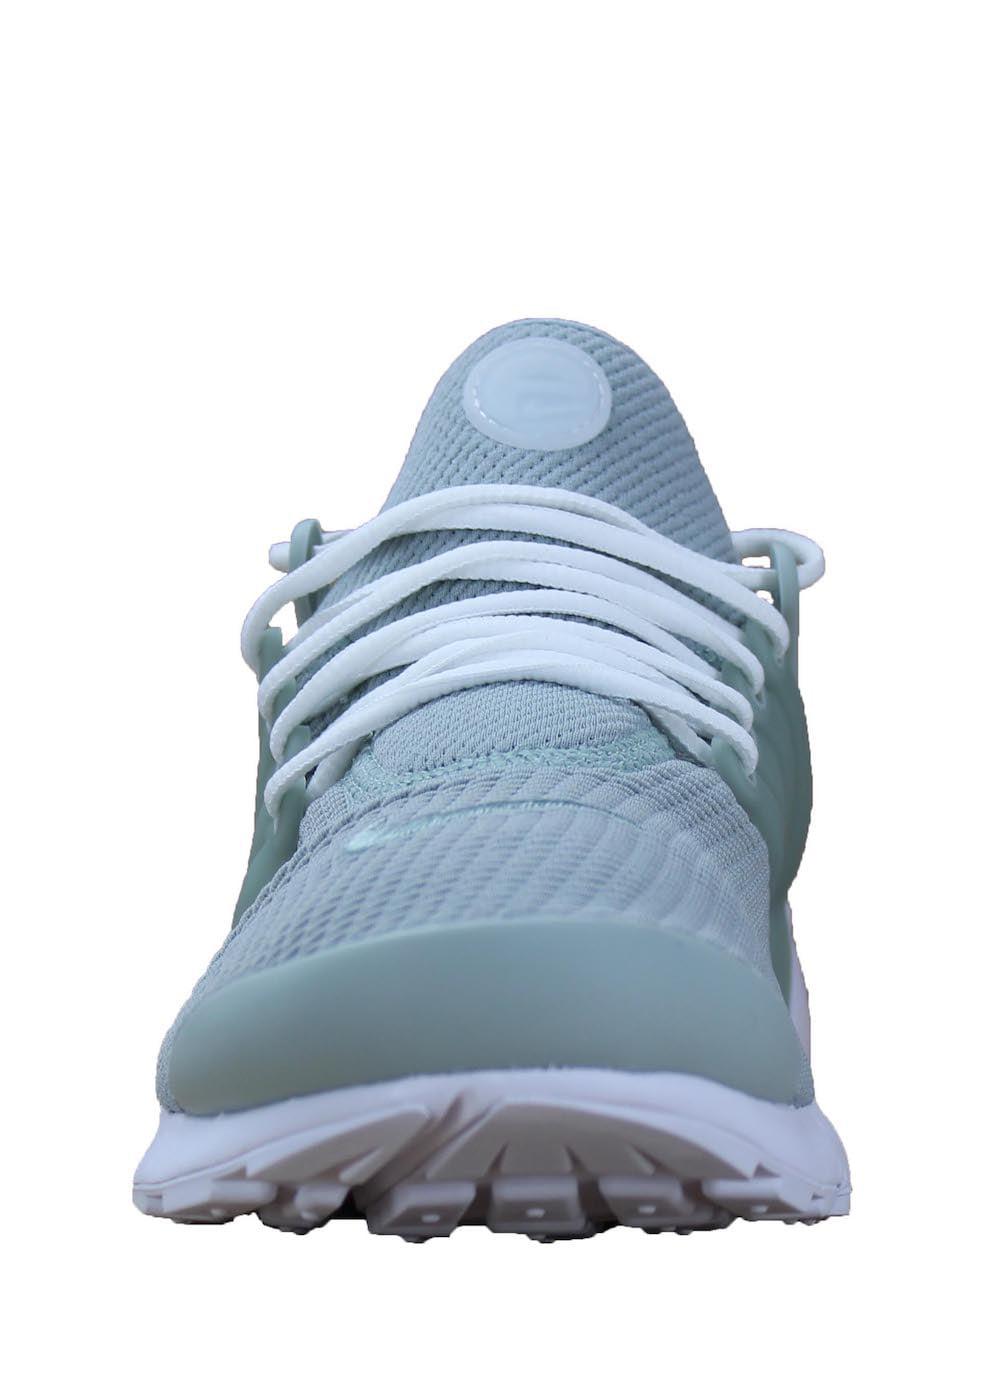 los angeles 866dd 58ae8 Nike - Nike Air Presto Womens Style  878068 - Walmart.com